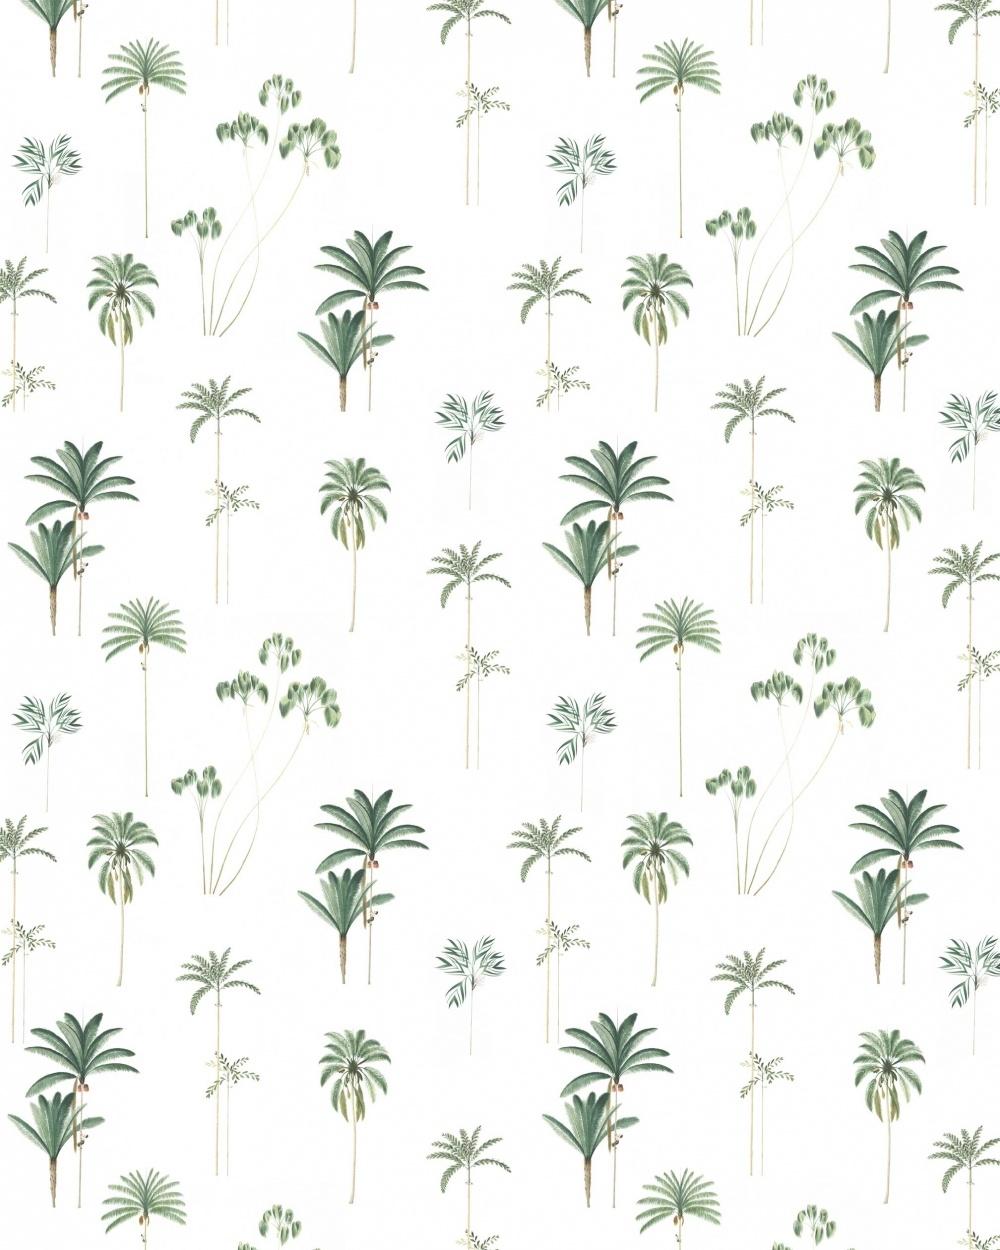 Creative Lab Amsterdam  Wall Paper Palms - 203x303cm - Prize per m2: € 27,00